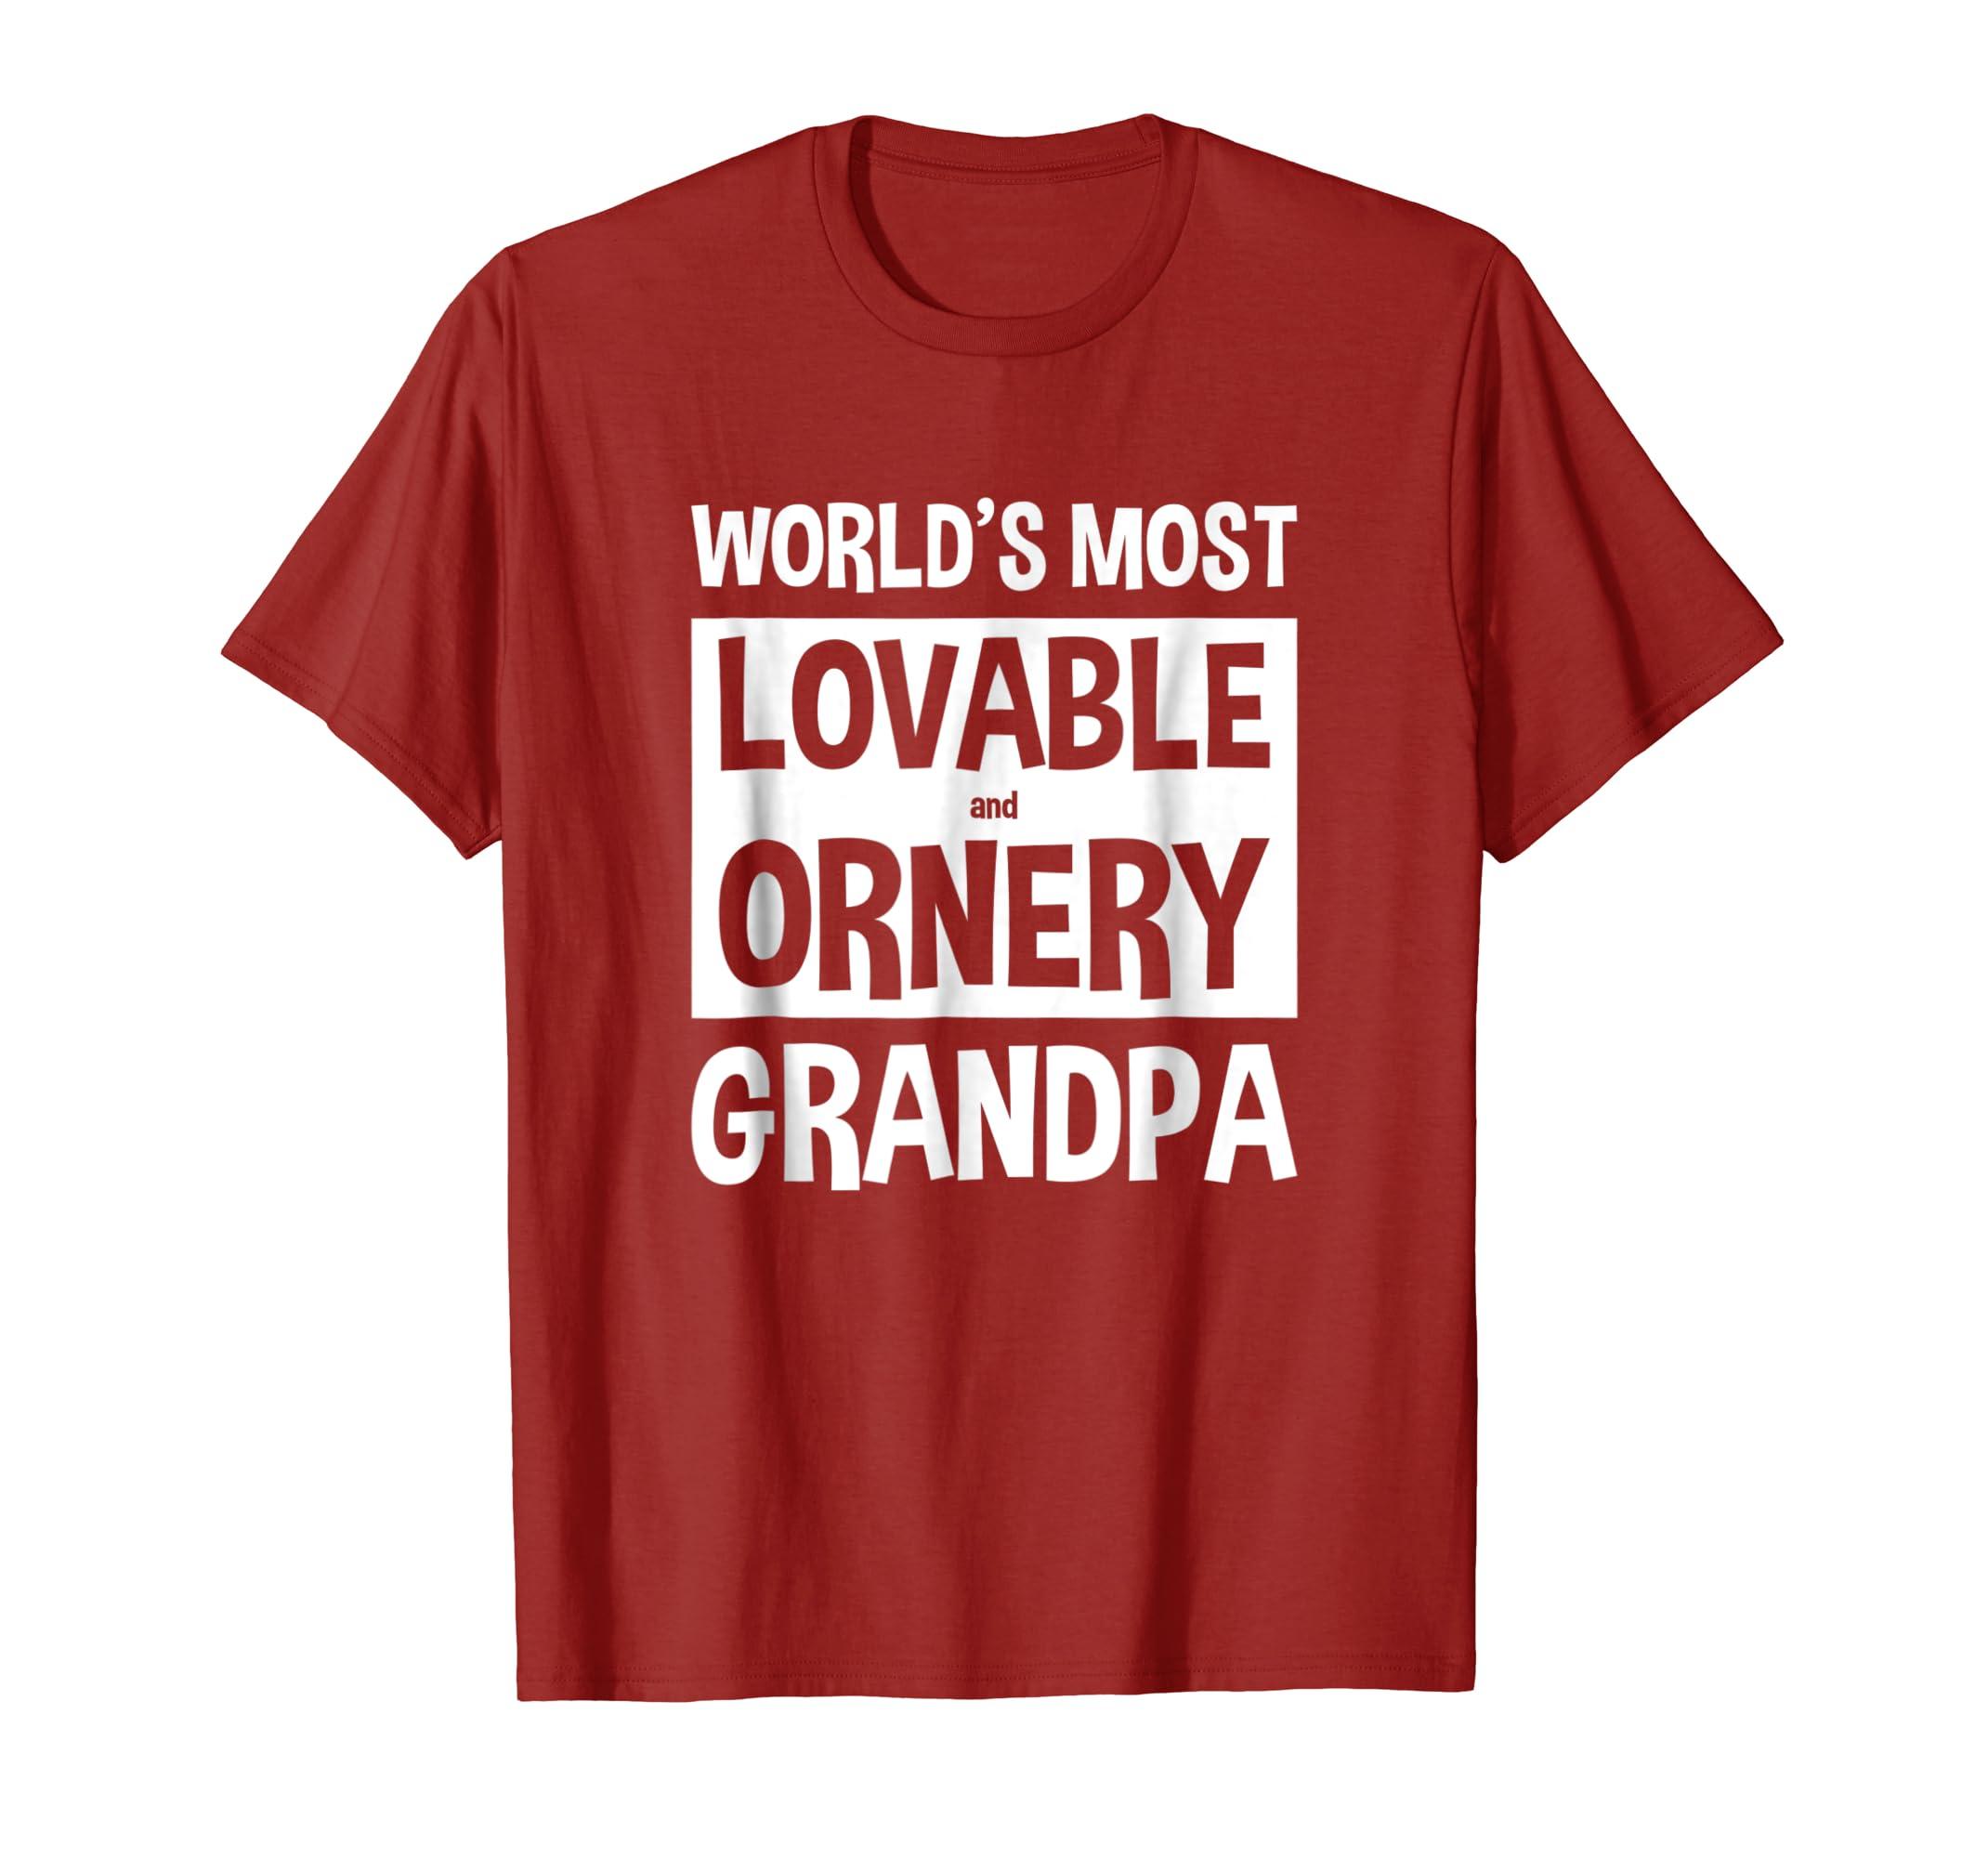 203b05986 Mens Funny Grandpa T shirt Lovable and Ornery-4LVS – 4loveshirt